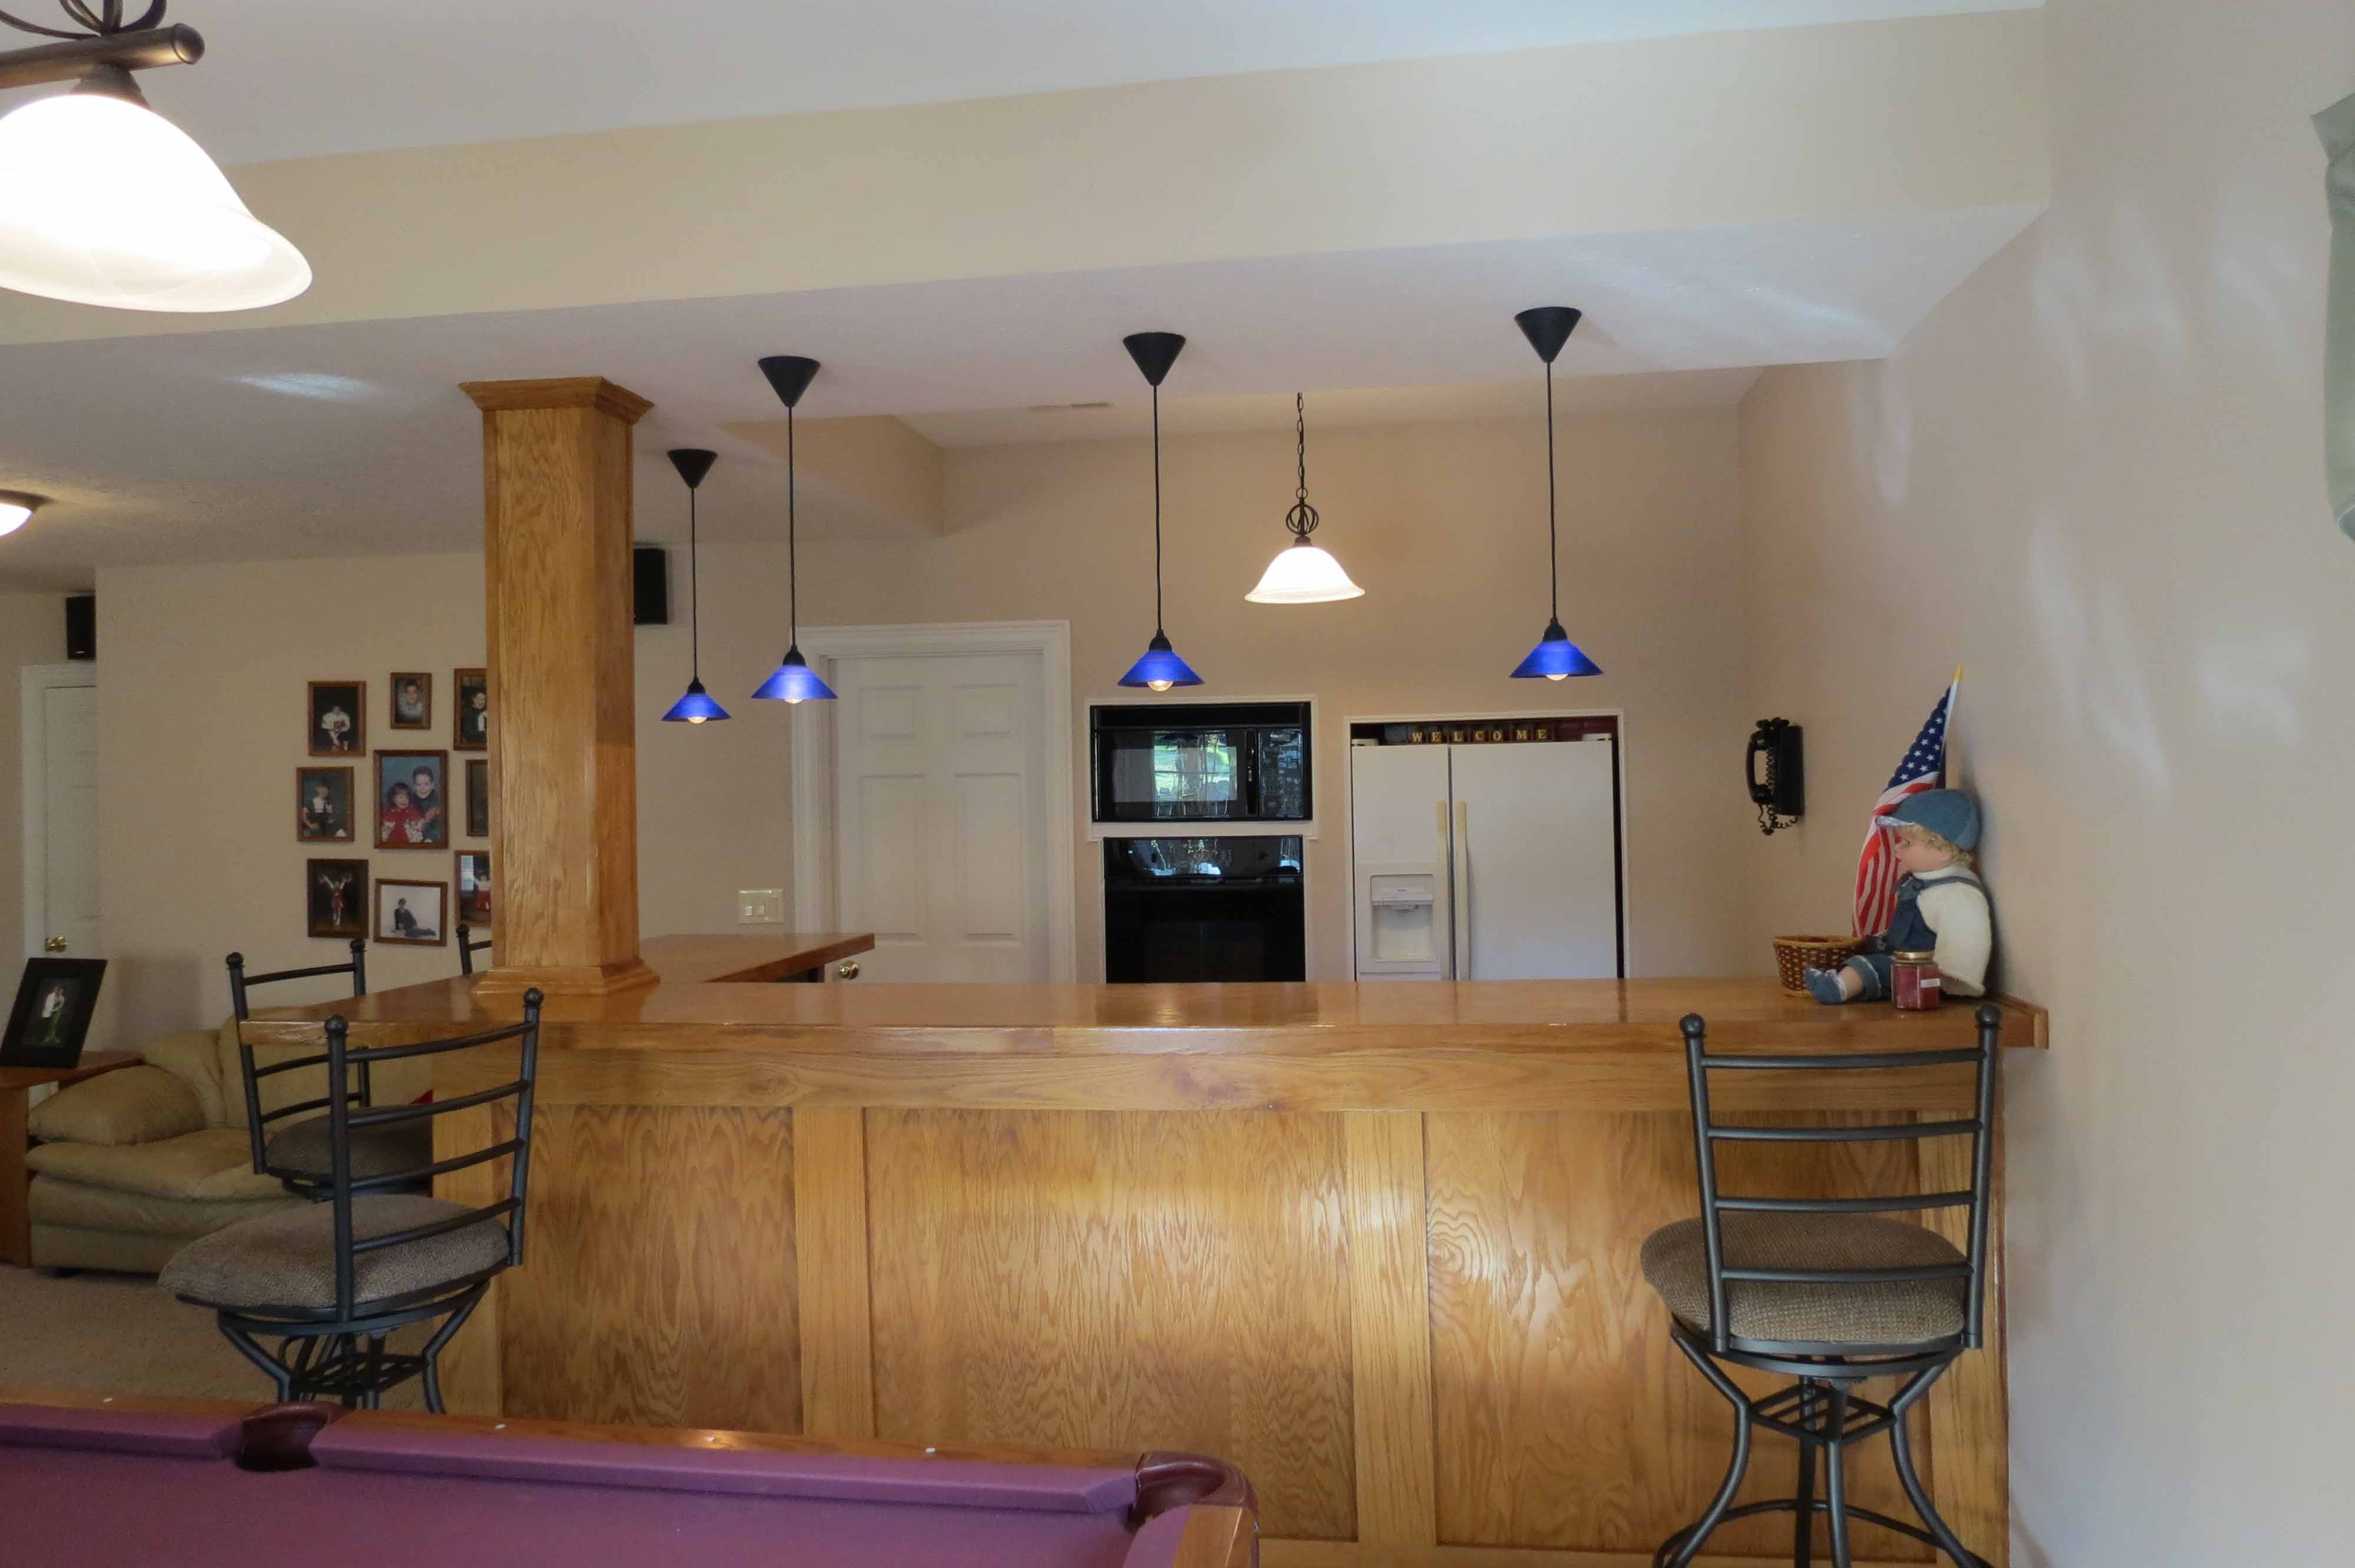 solar light lighting beacon lights interior alternative led